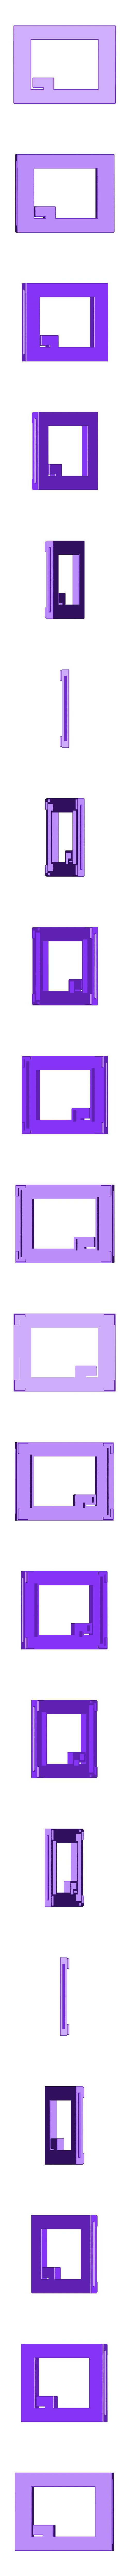 Bismount-Blue.STL Download STL file Bismuth GEM from Steven Universe, Wearable Plastic Crystal Gemstone Rainbow Color Prop, Bismouths Gems Costume, Cosplay, Comiccon, or Halloween • 3D printable design, mechengineermike